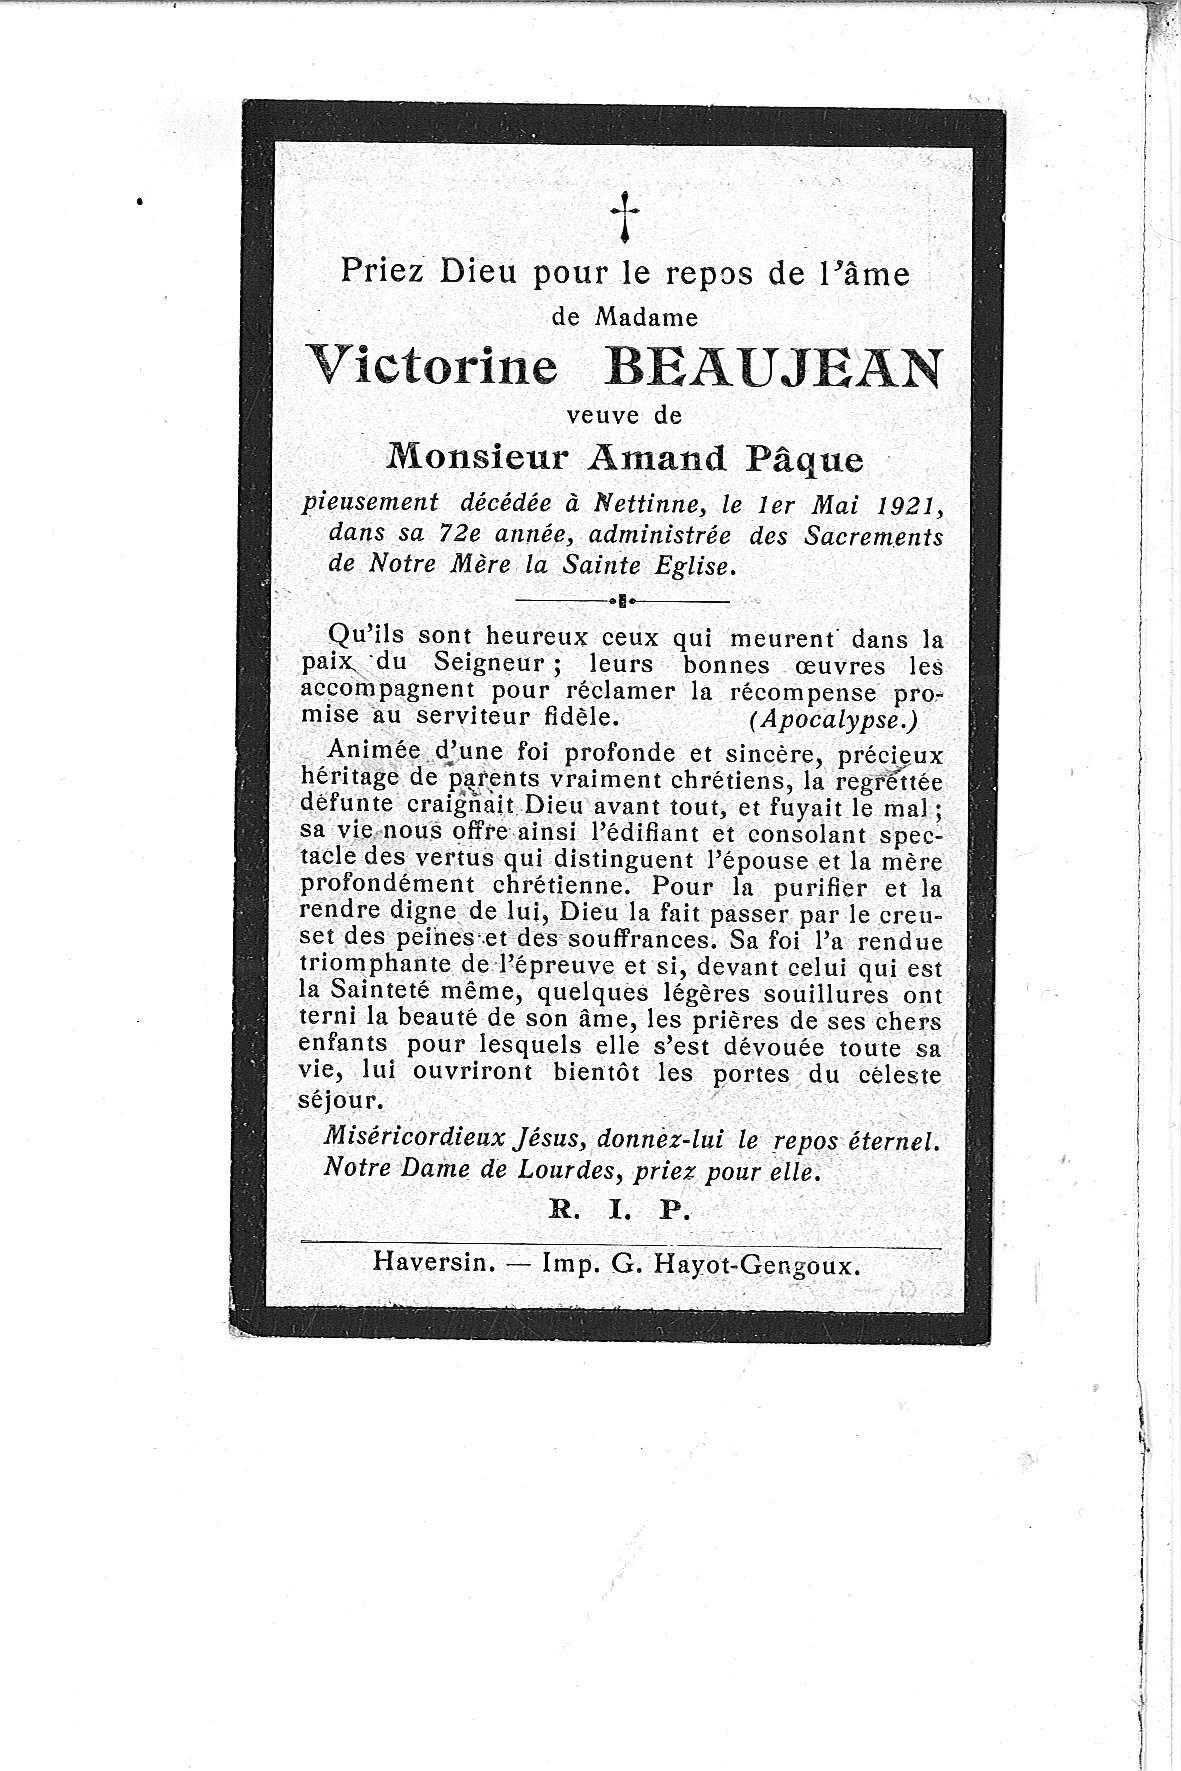 Victorine(1921)20101117134816_00014.jpg